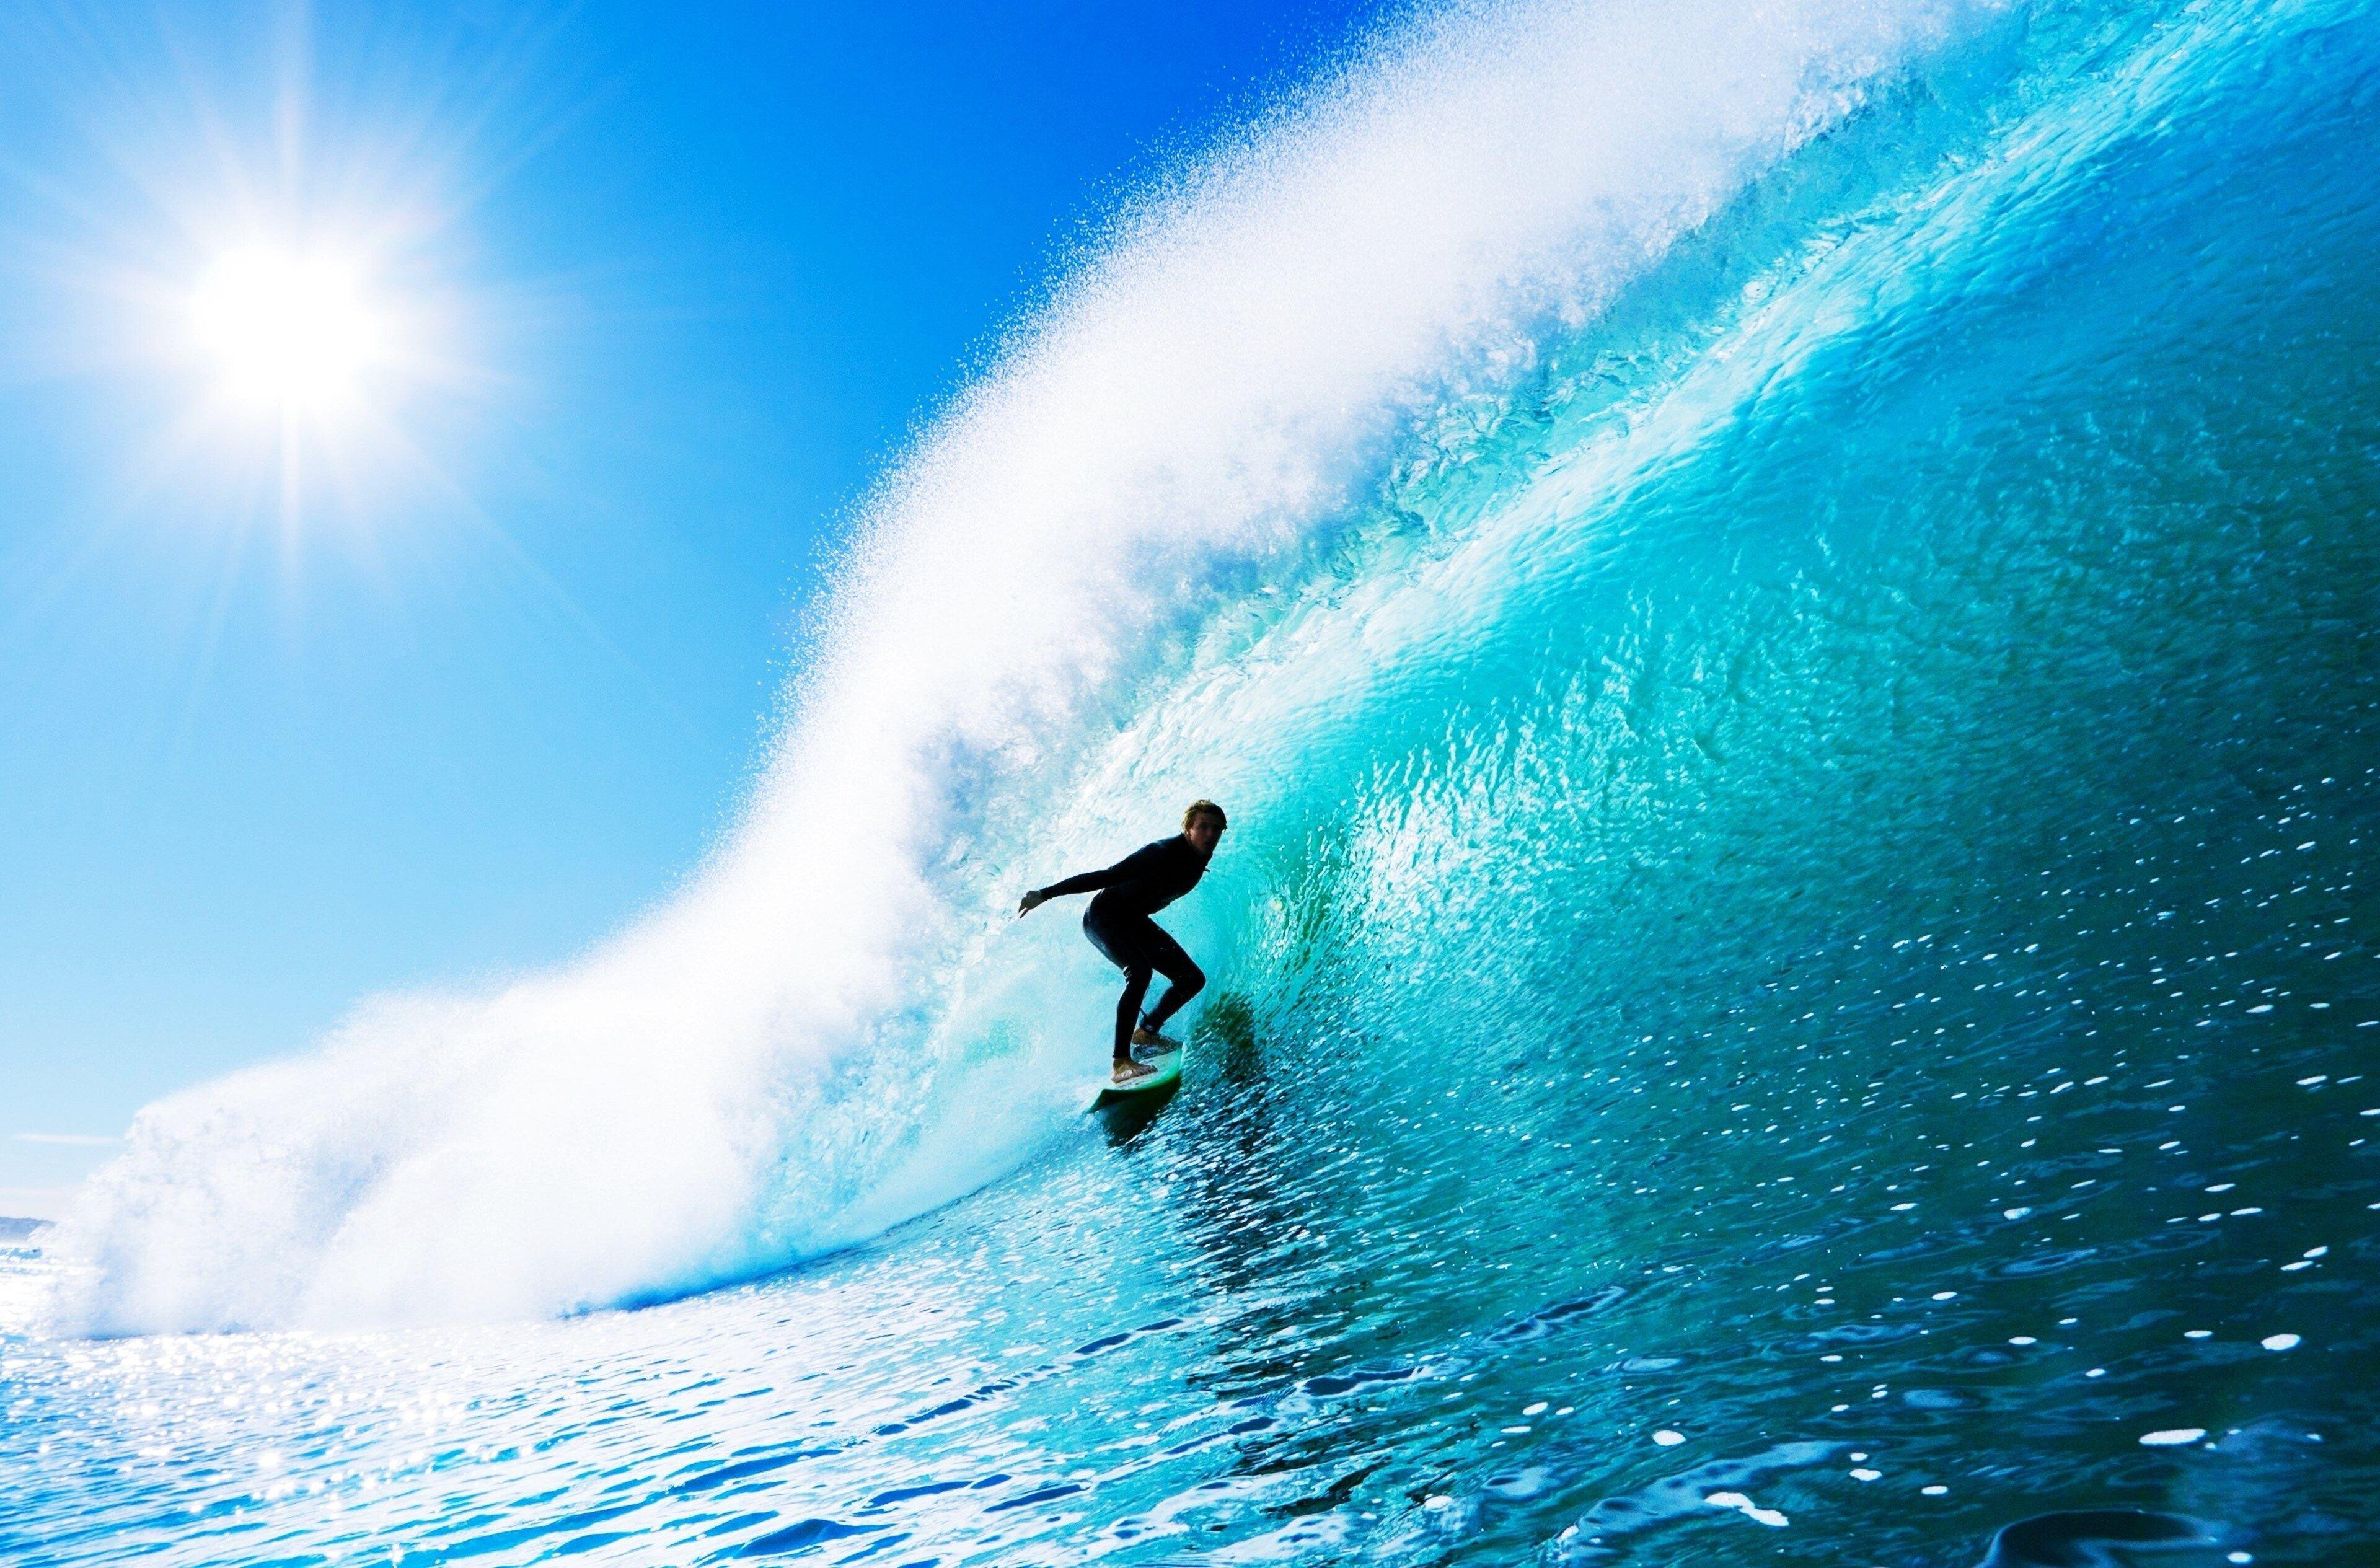 3840x2530 Surfing 4k Hq Desktop Wallpaper In 2019 Surfing